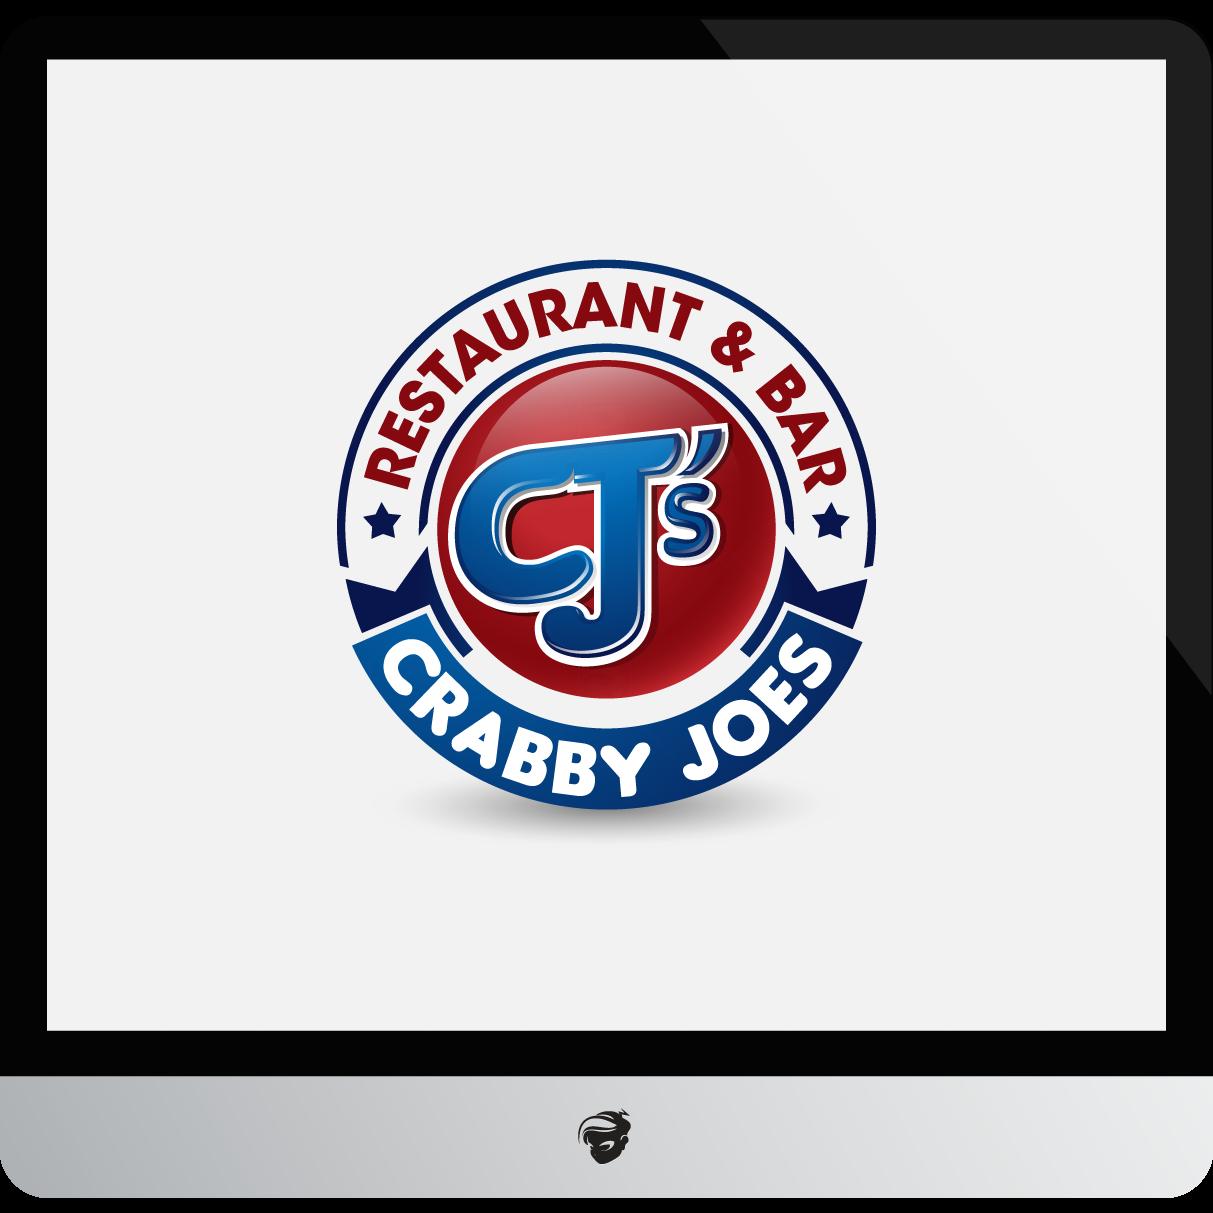 Logo Design by zesthar - Entry No. 71 in the Logo Design Contest Inspiring Logo Design for Cj's.